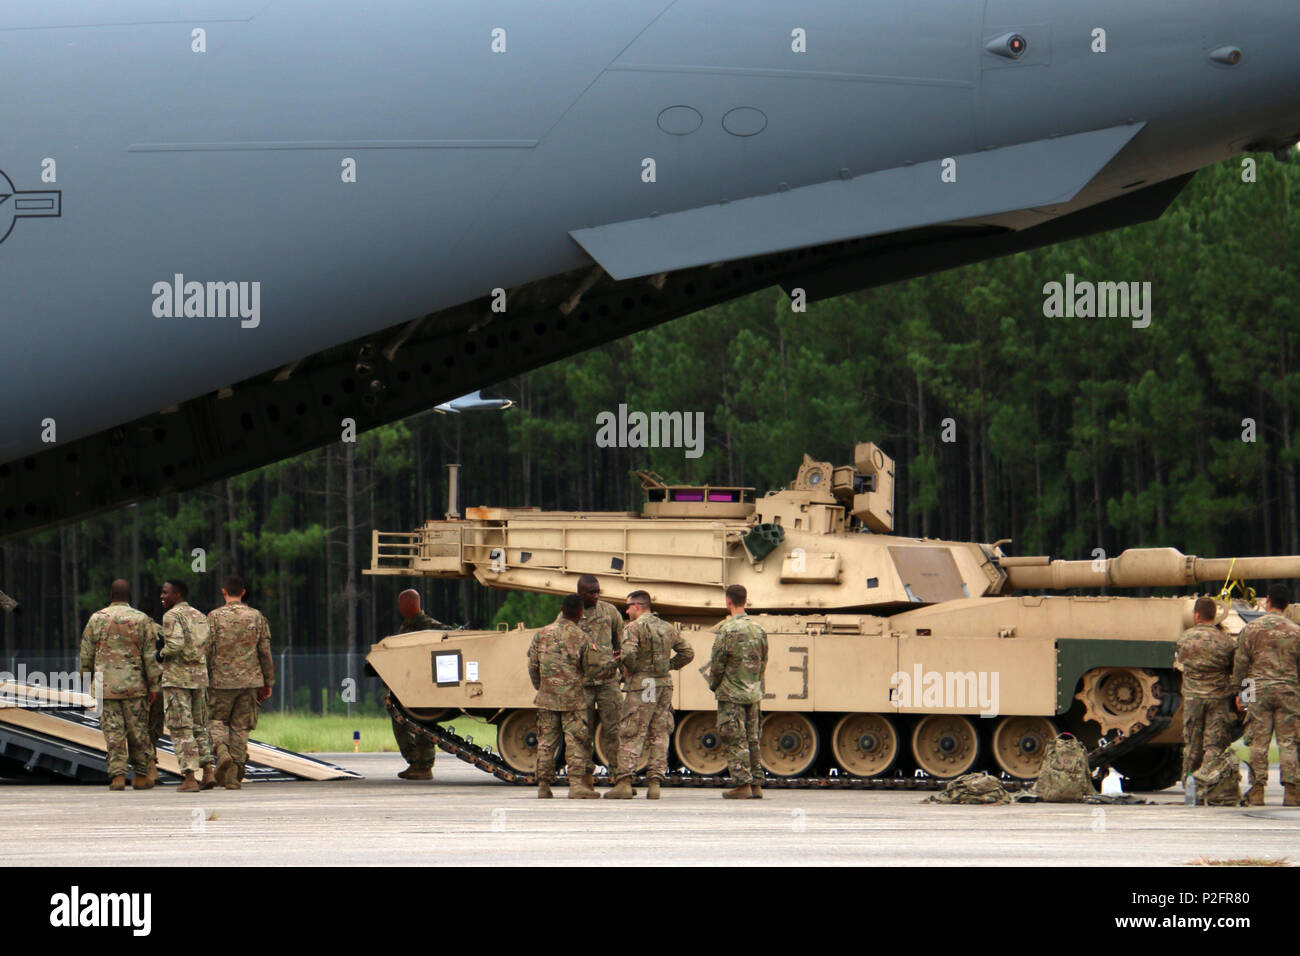 Infantry Support Tank Stockfotos & Infantry Support Tank Bilder ...